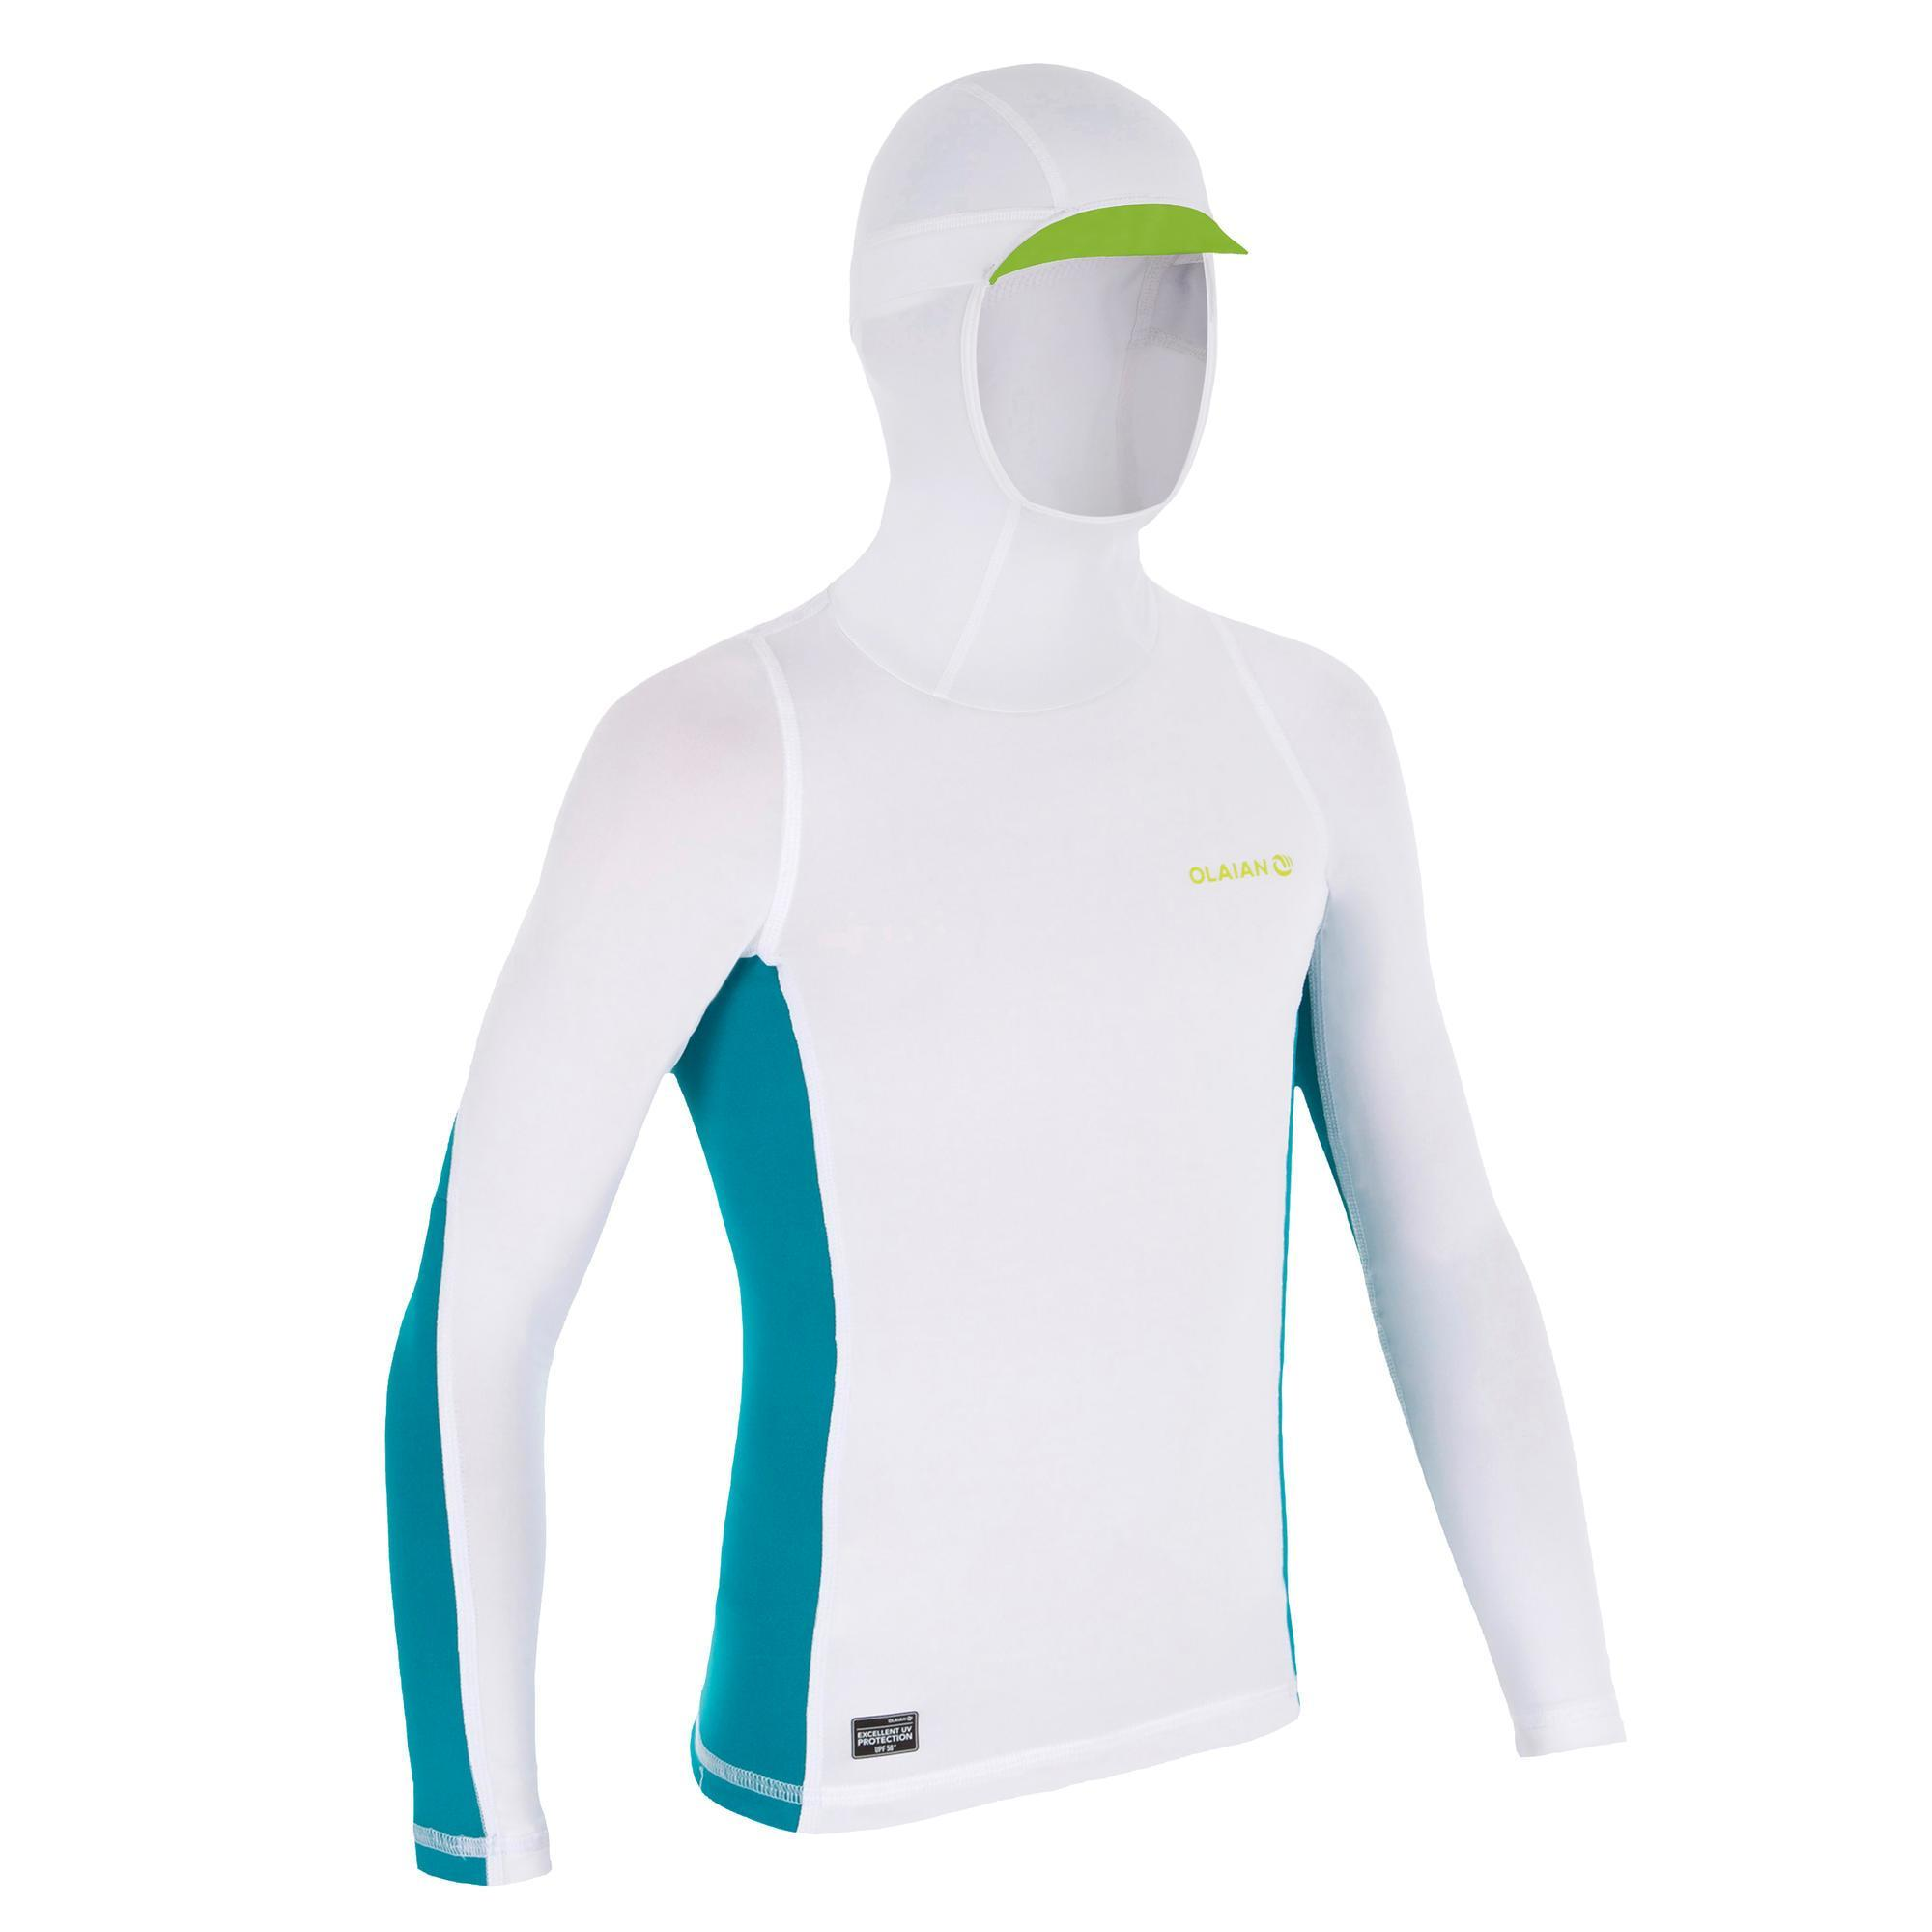 4086b3146 Top Camiseta Protección Solar Playa Surf Olaian Top500 Niño Blanco Turquesa  Olaian